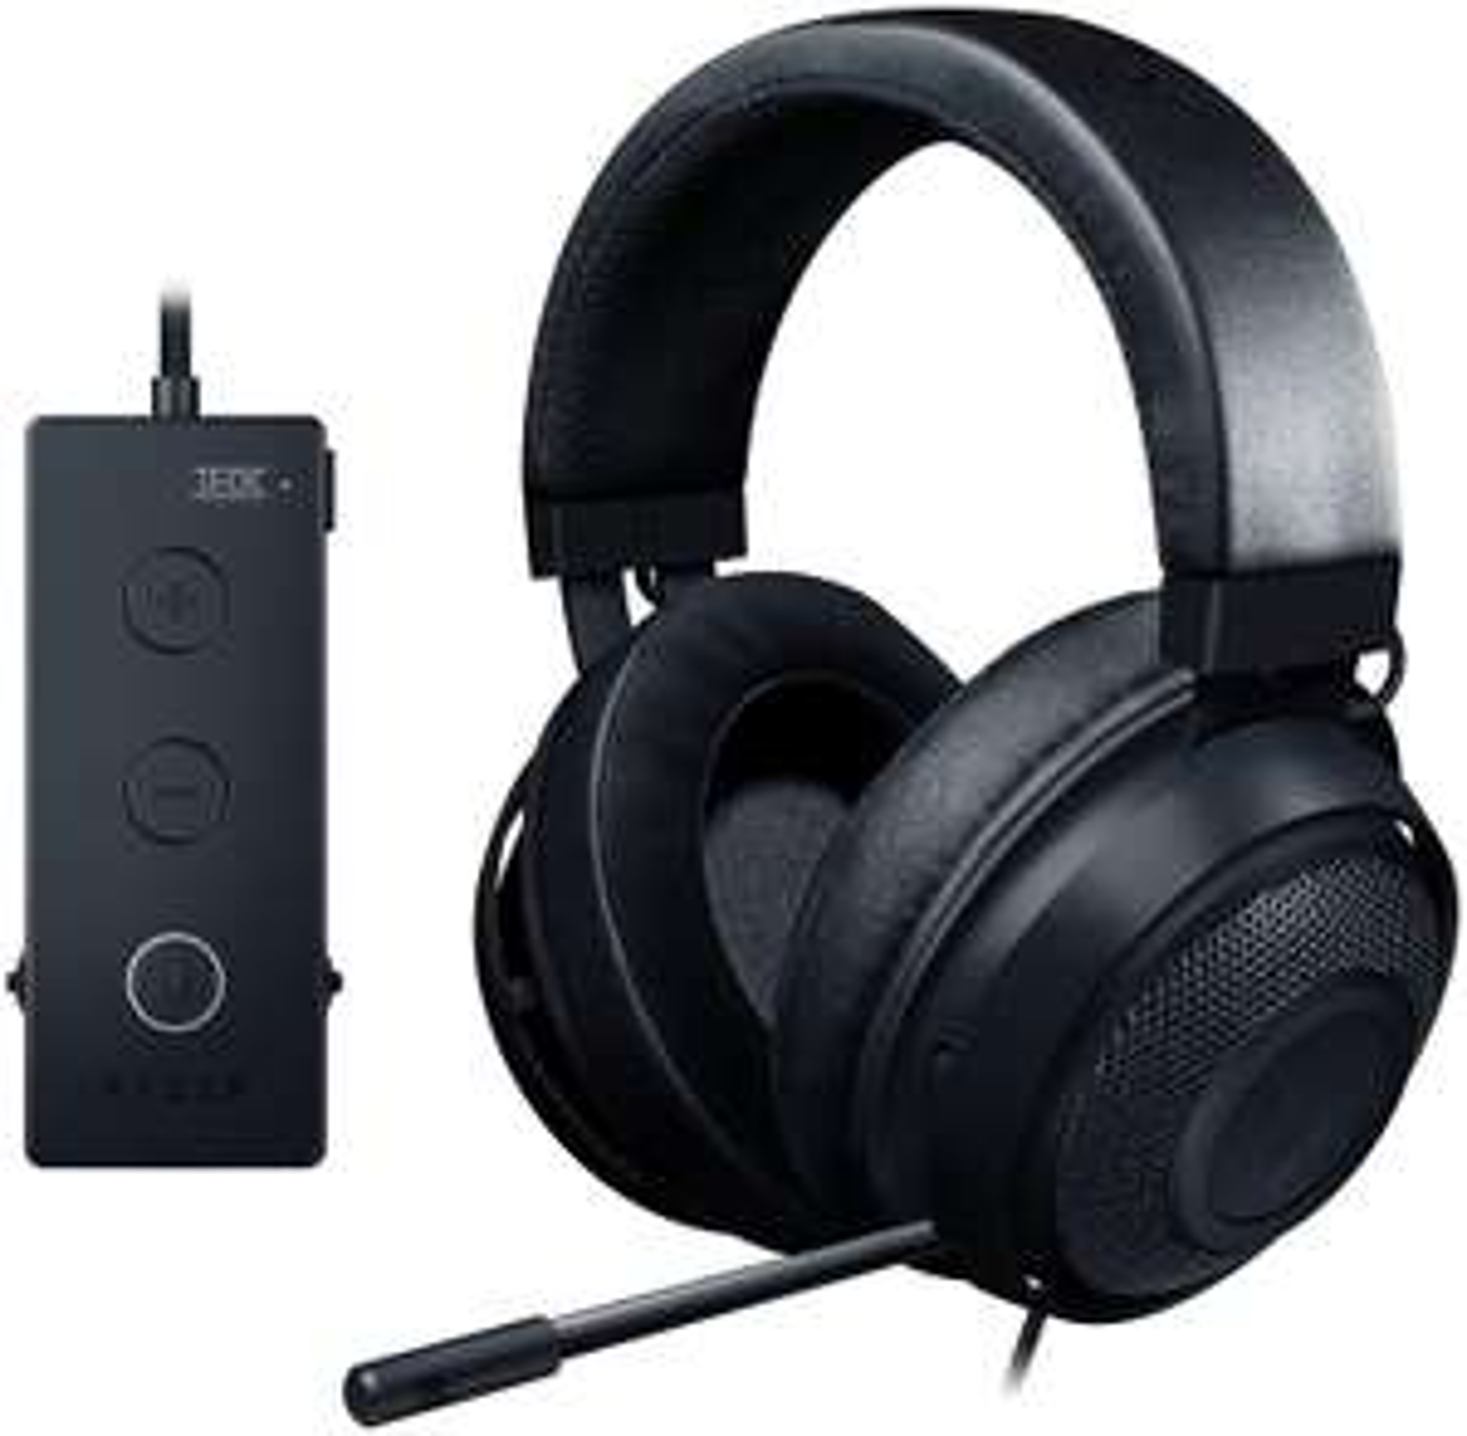 Razer Kraken Tournament Edition, Wired Esports Gaming Headset with Full Audio Control £66.18 at Amazon